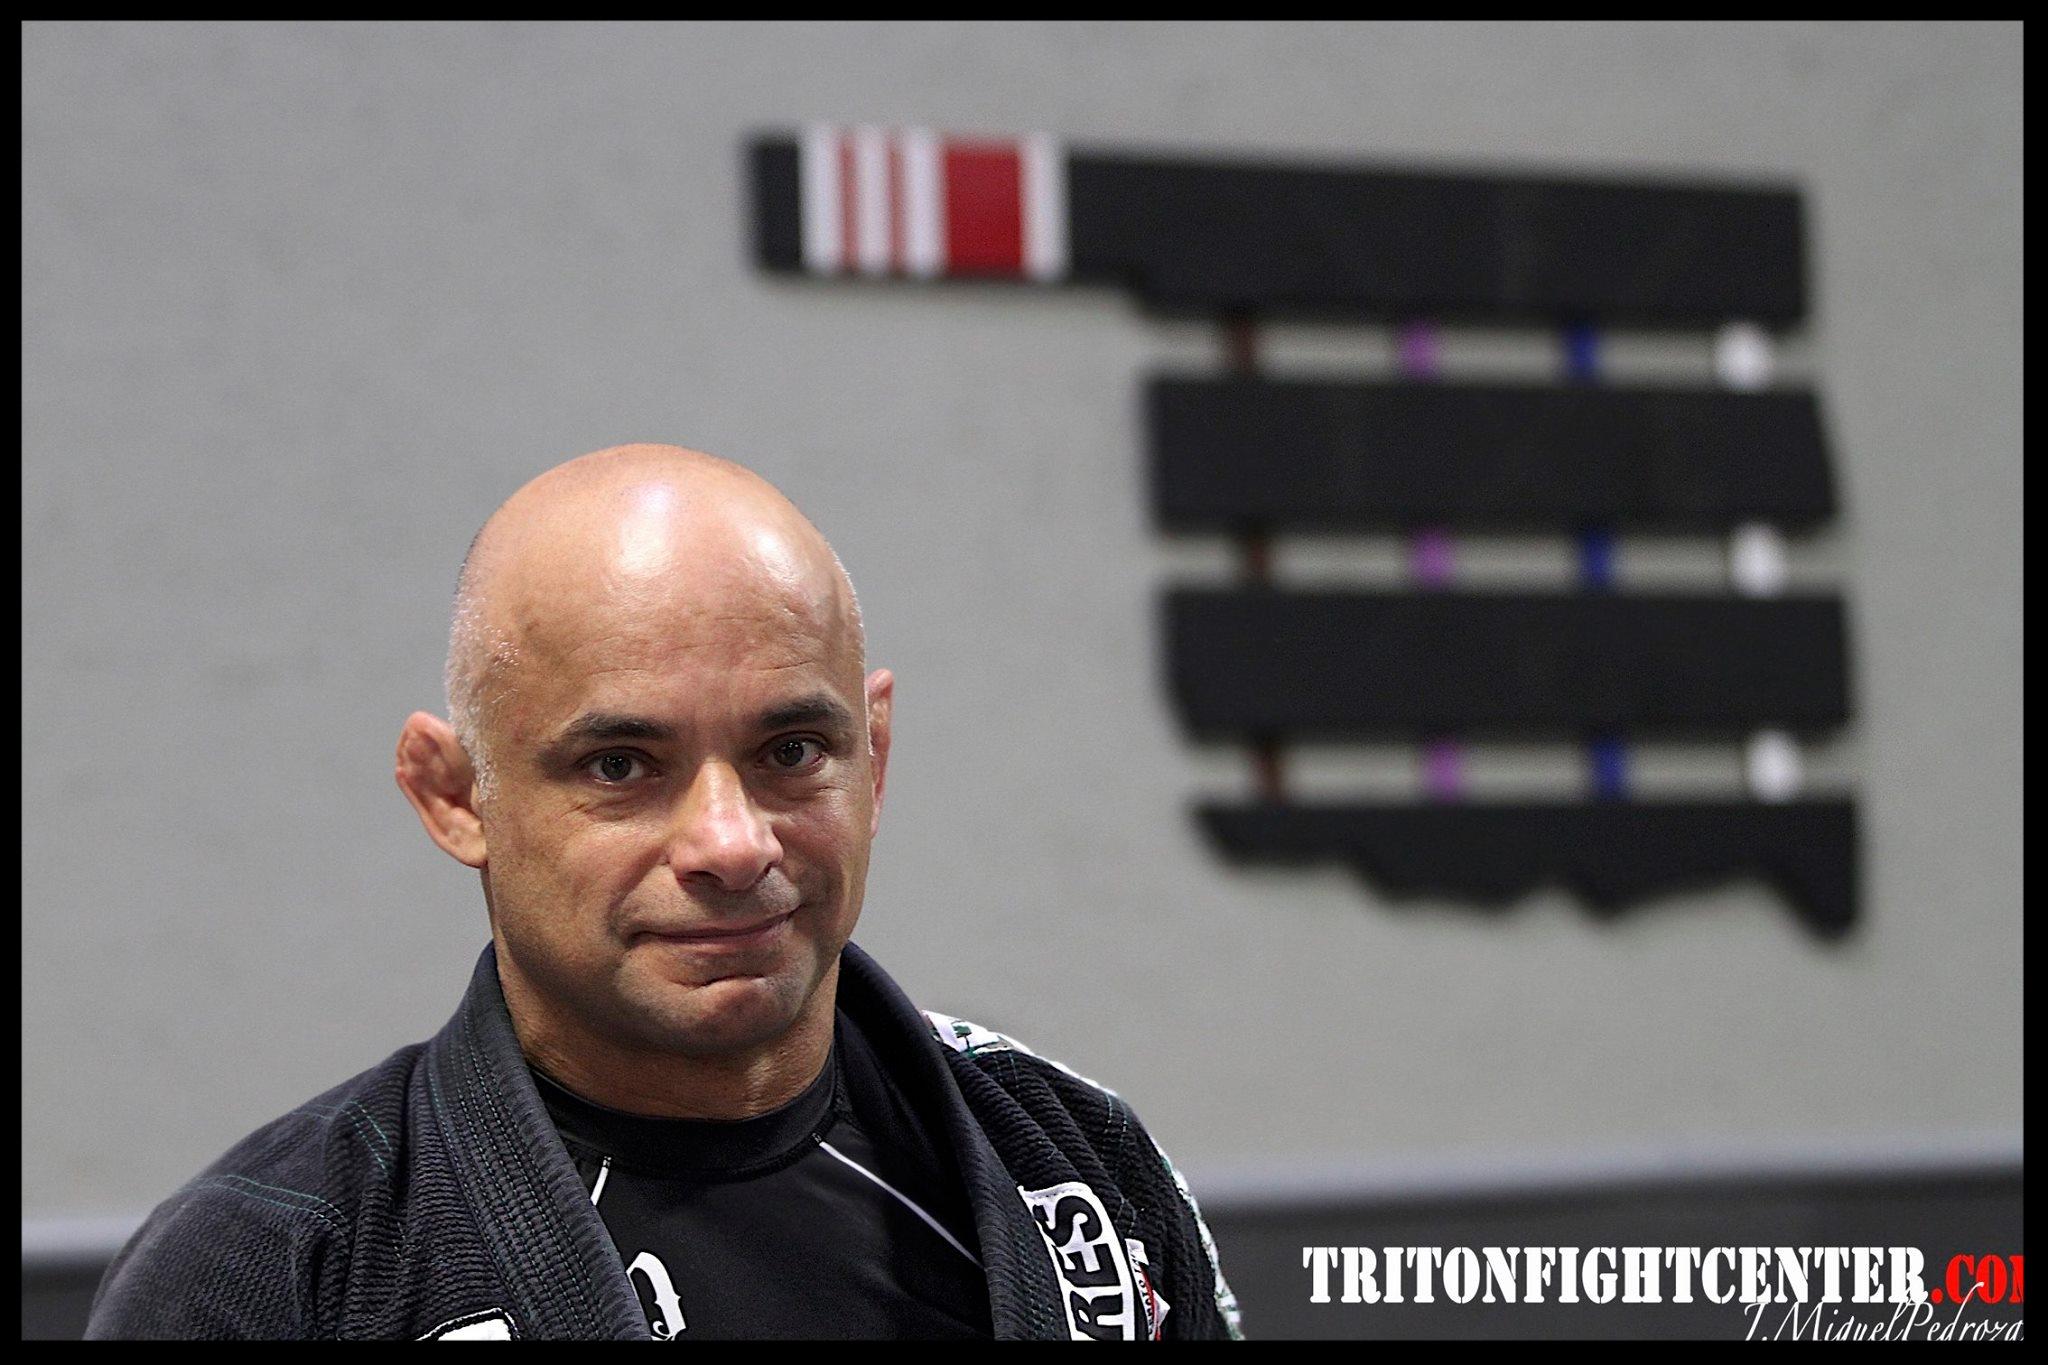 5th degree black belt Master Renato Tavares